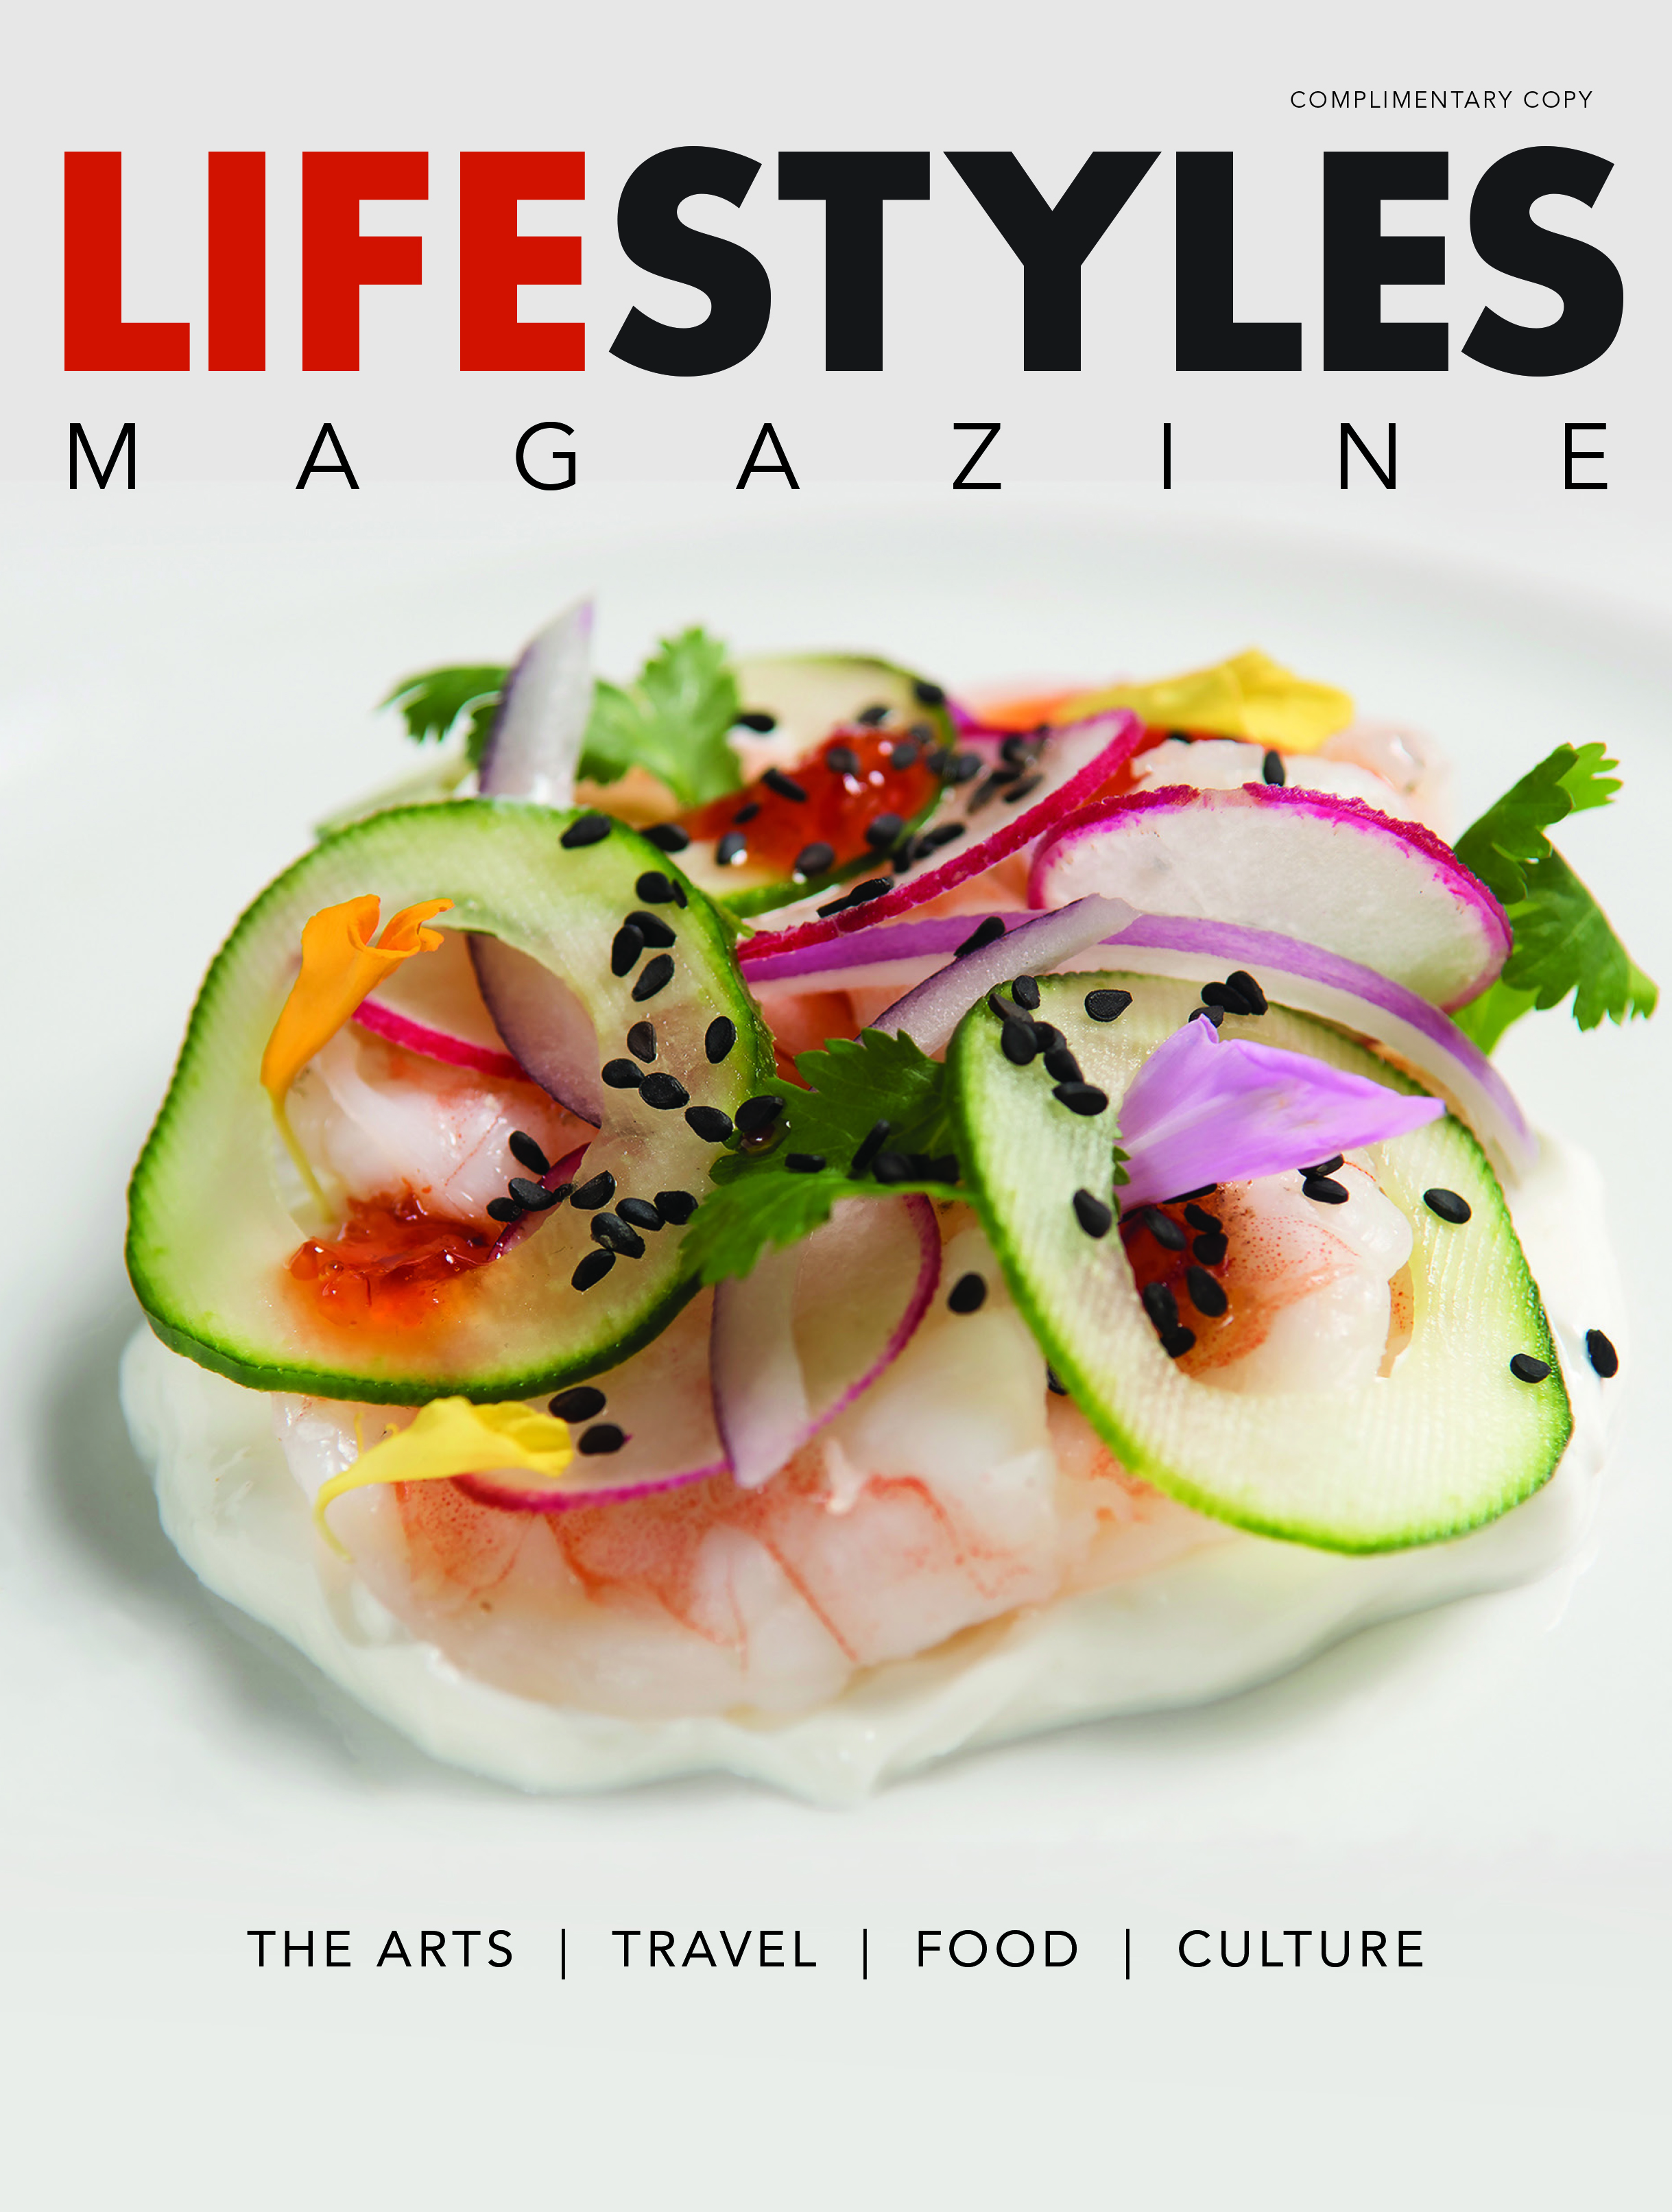 Tyler Paper Lifestyles Magazine Cover.jpg